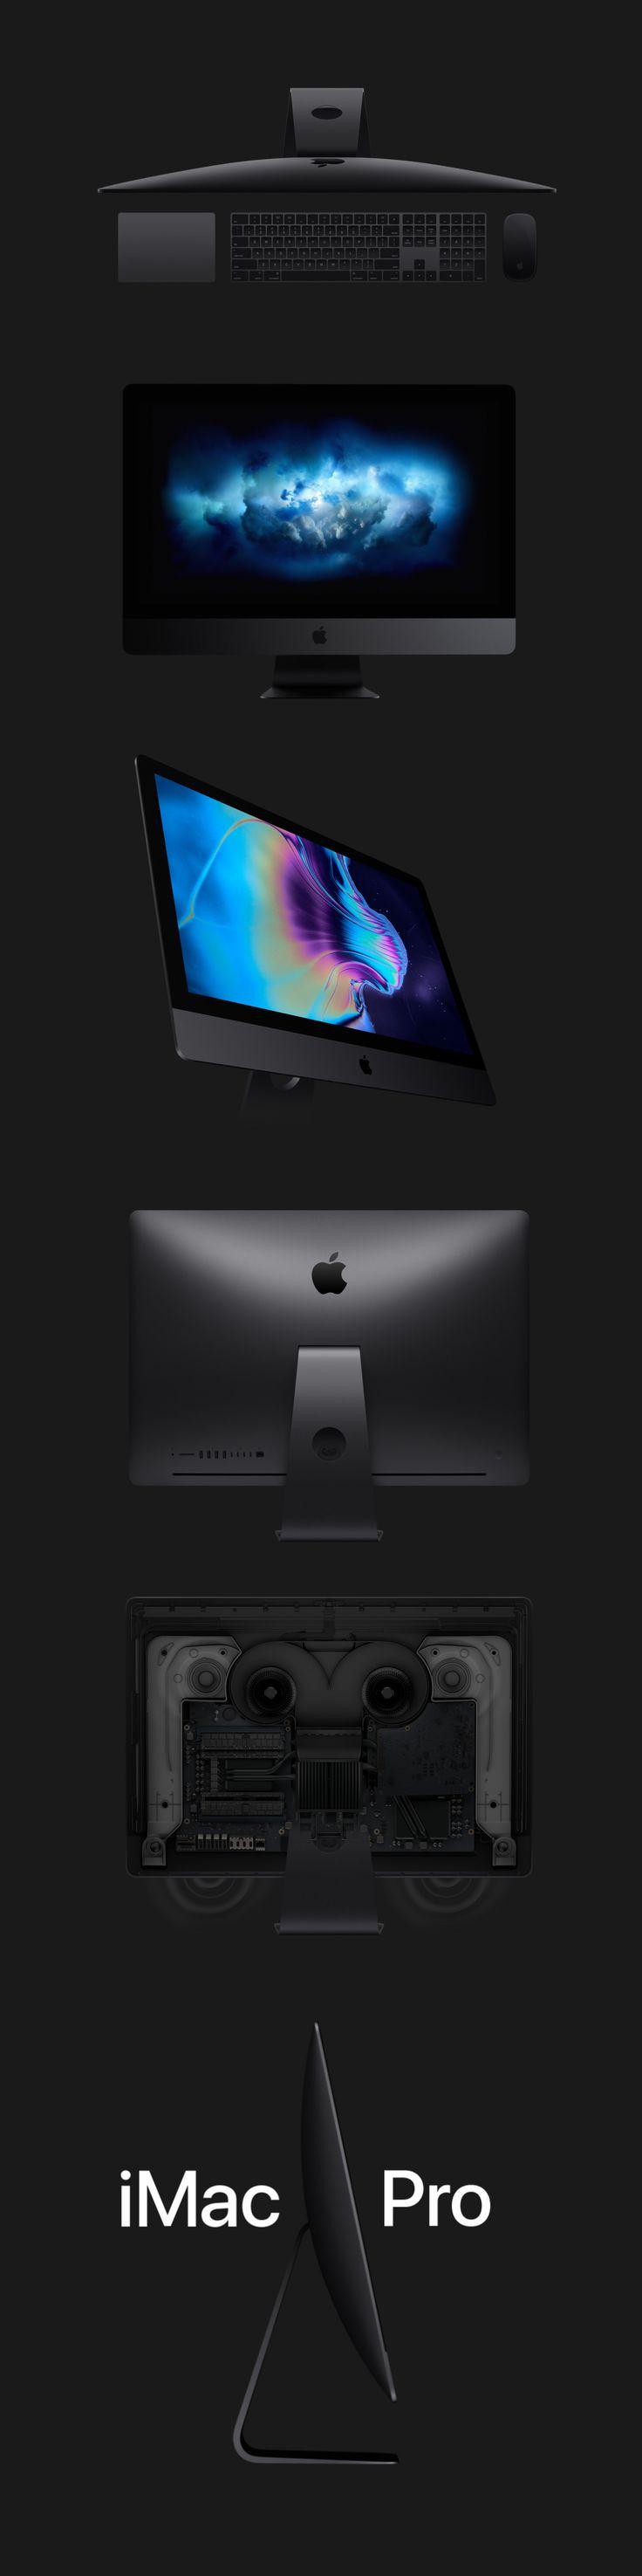 New #Apple #iMac #Pro #computer